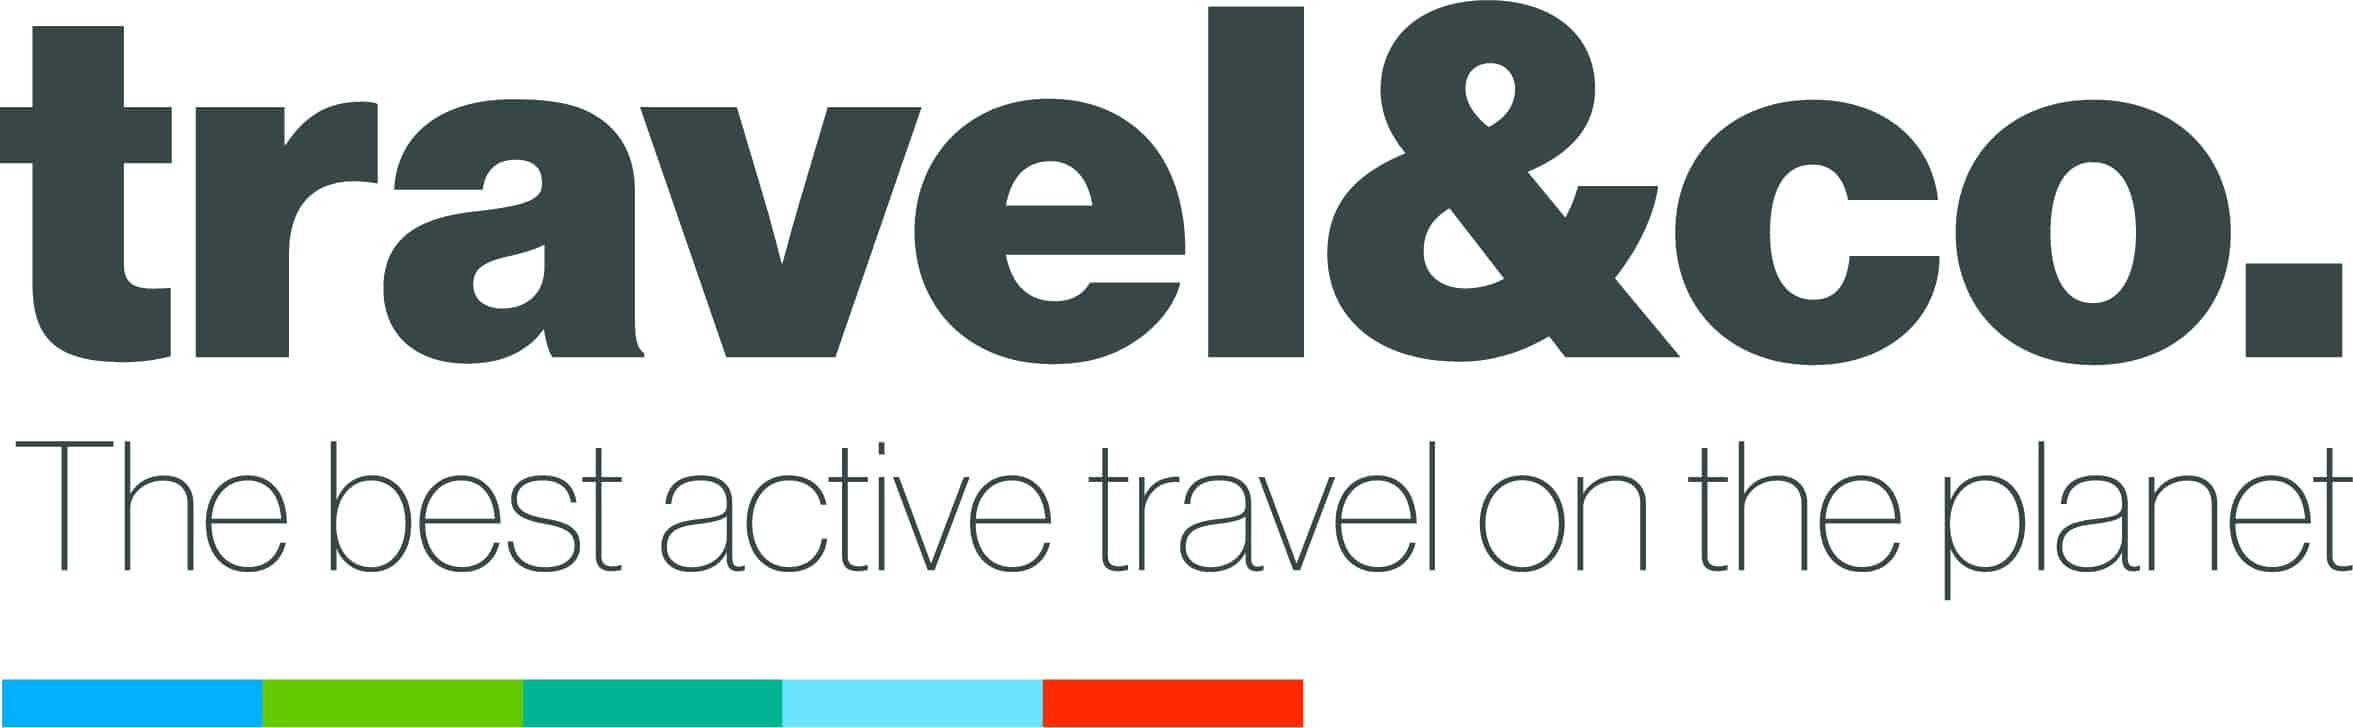 travel&co